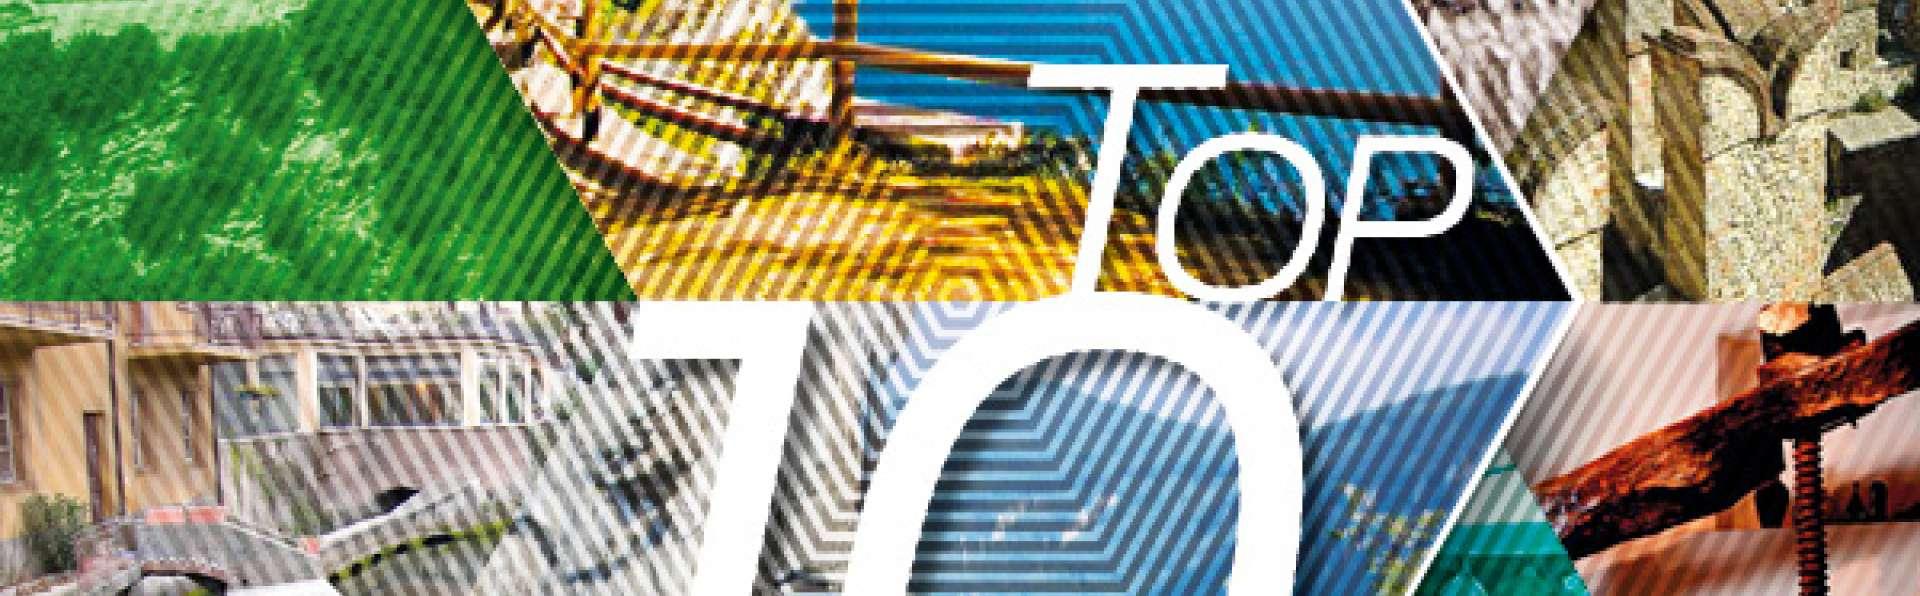 TOP 10 Free Destinations on Lake Garda